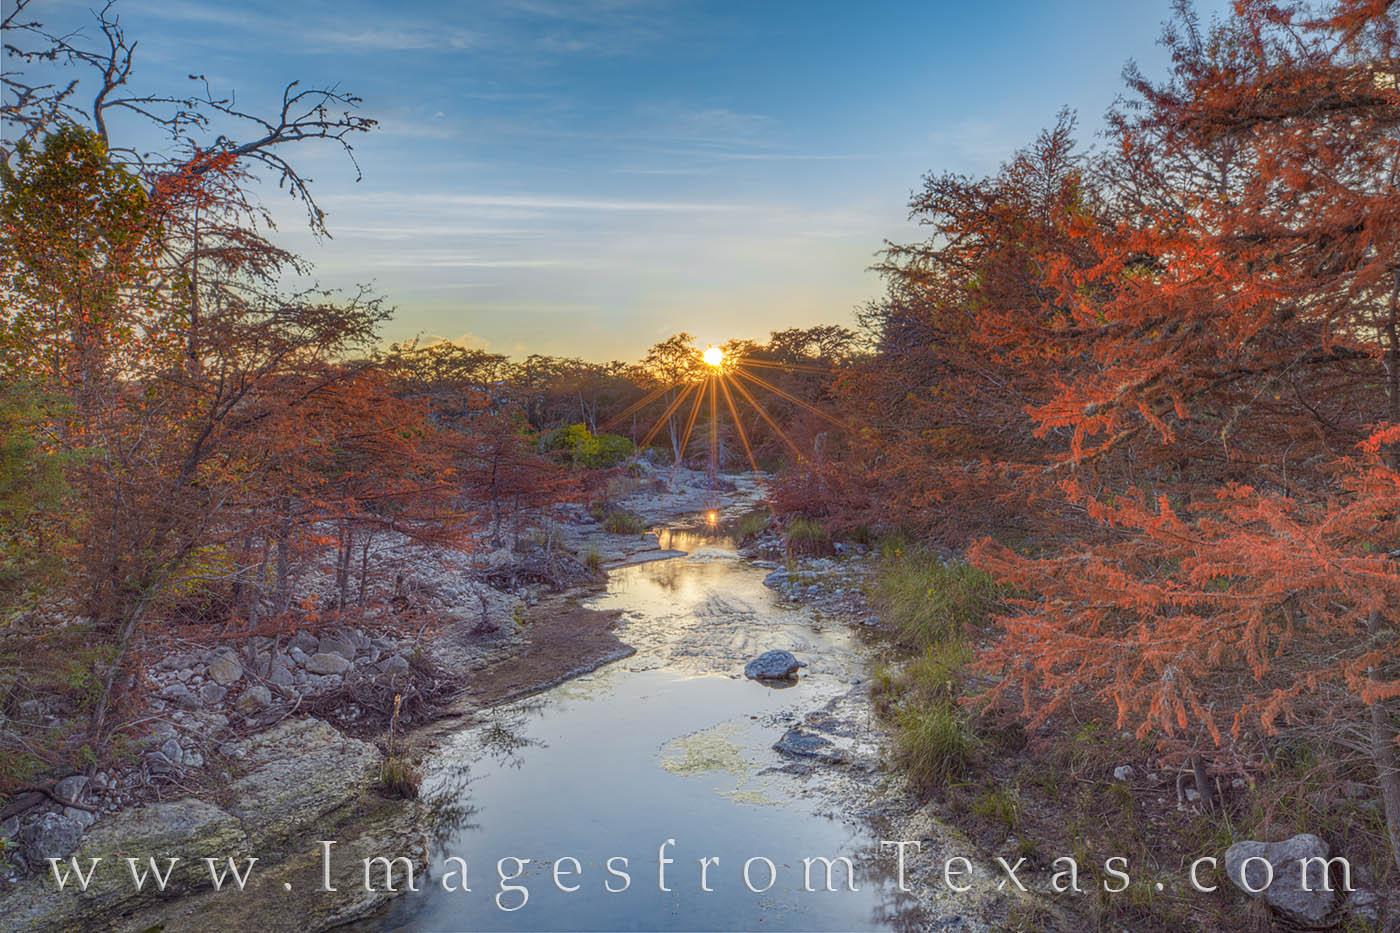 texas hill country, fall colors, sabinal river, waterfall, autumn colors, autumn, texas texas rivers, texas fall colors, medina, vanderpool, photo